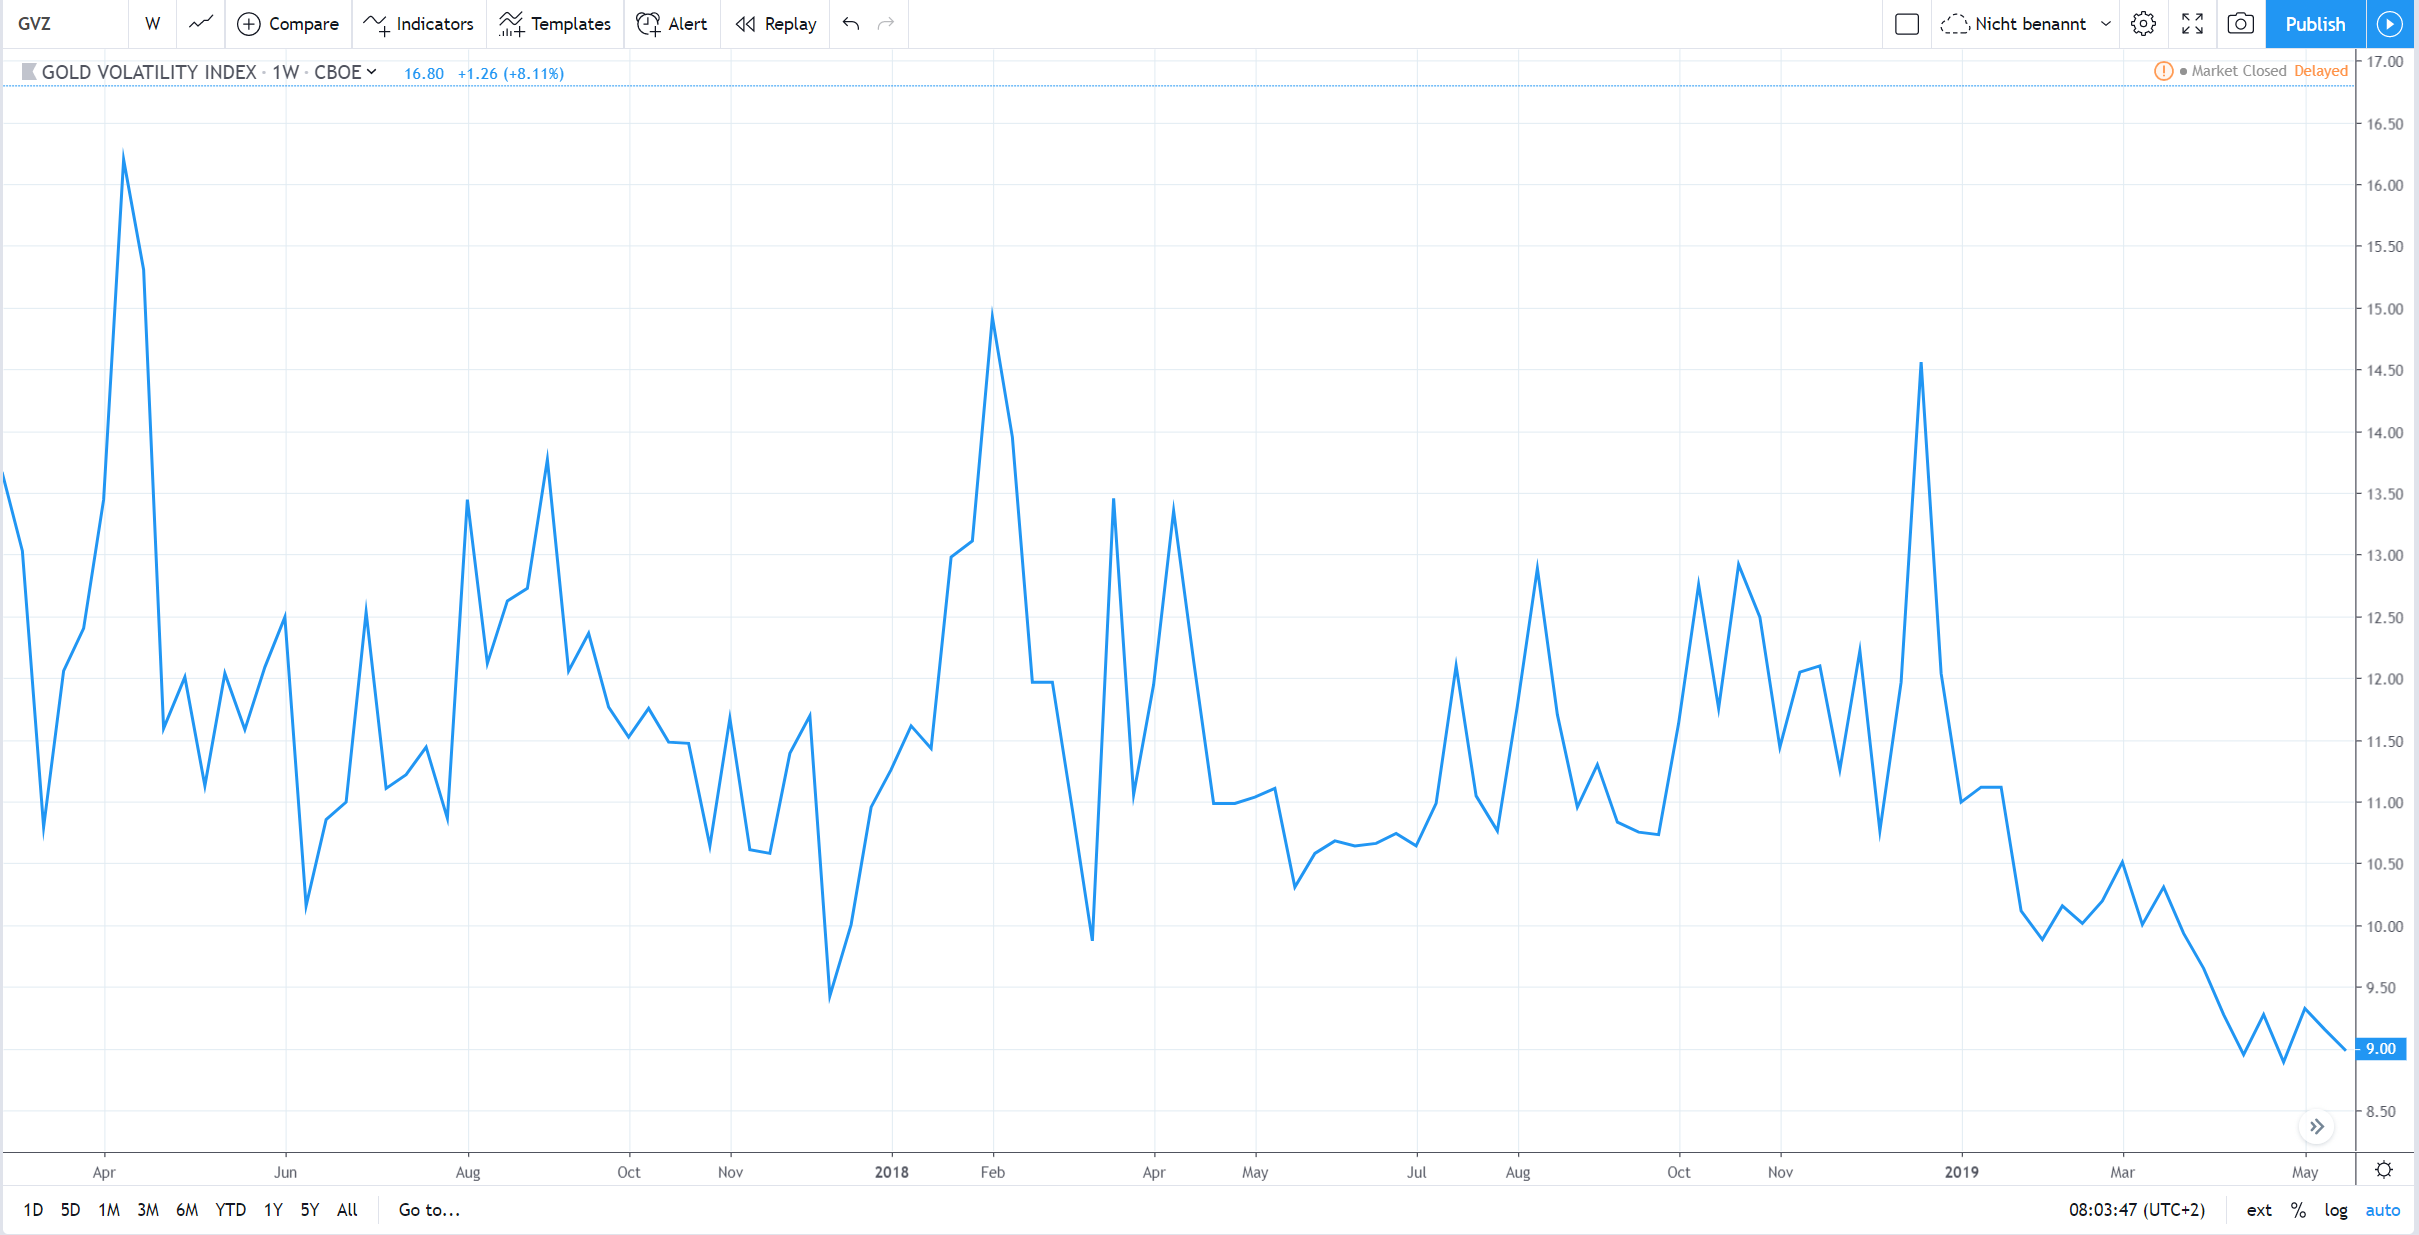 GVZ Gold Volatility - Volatilität in Gold